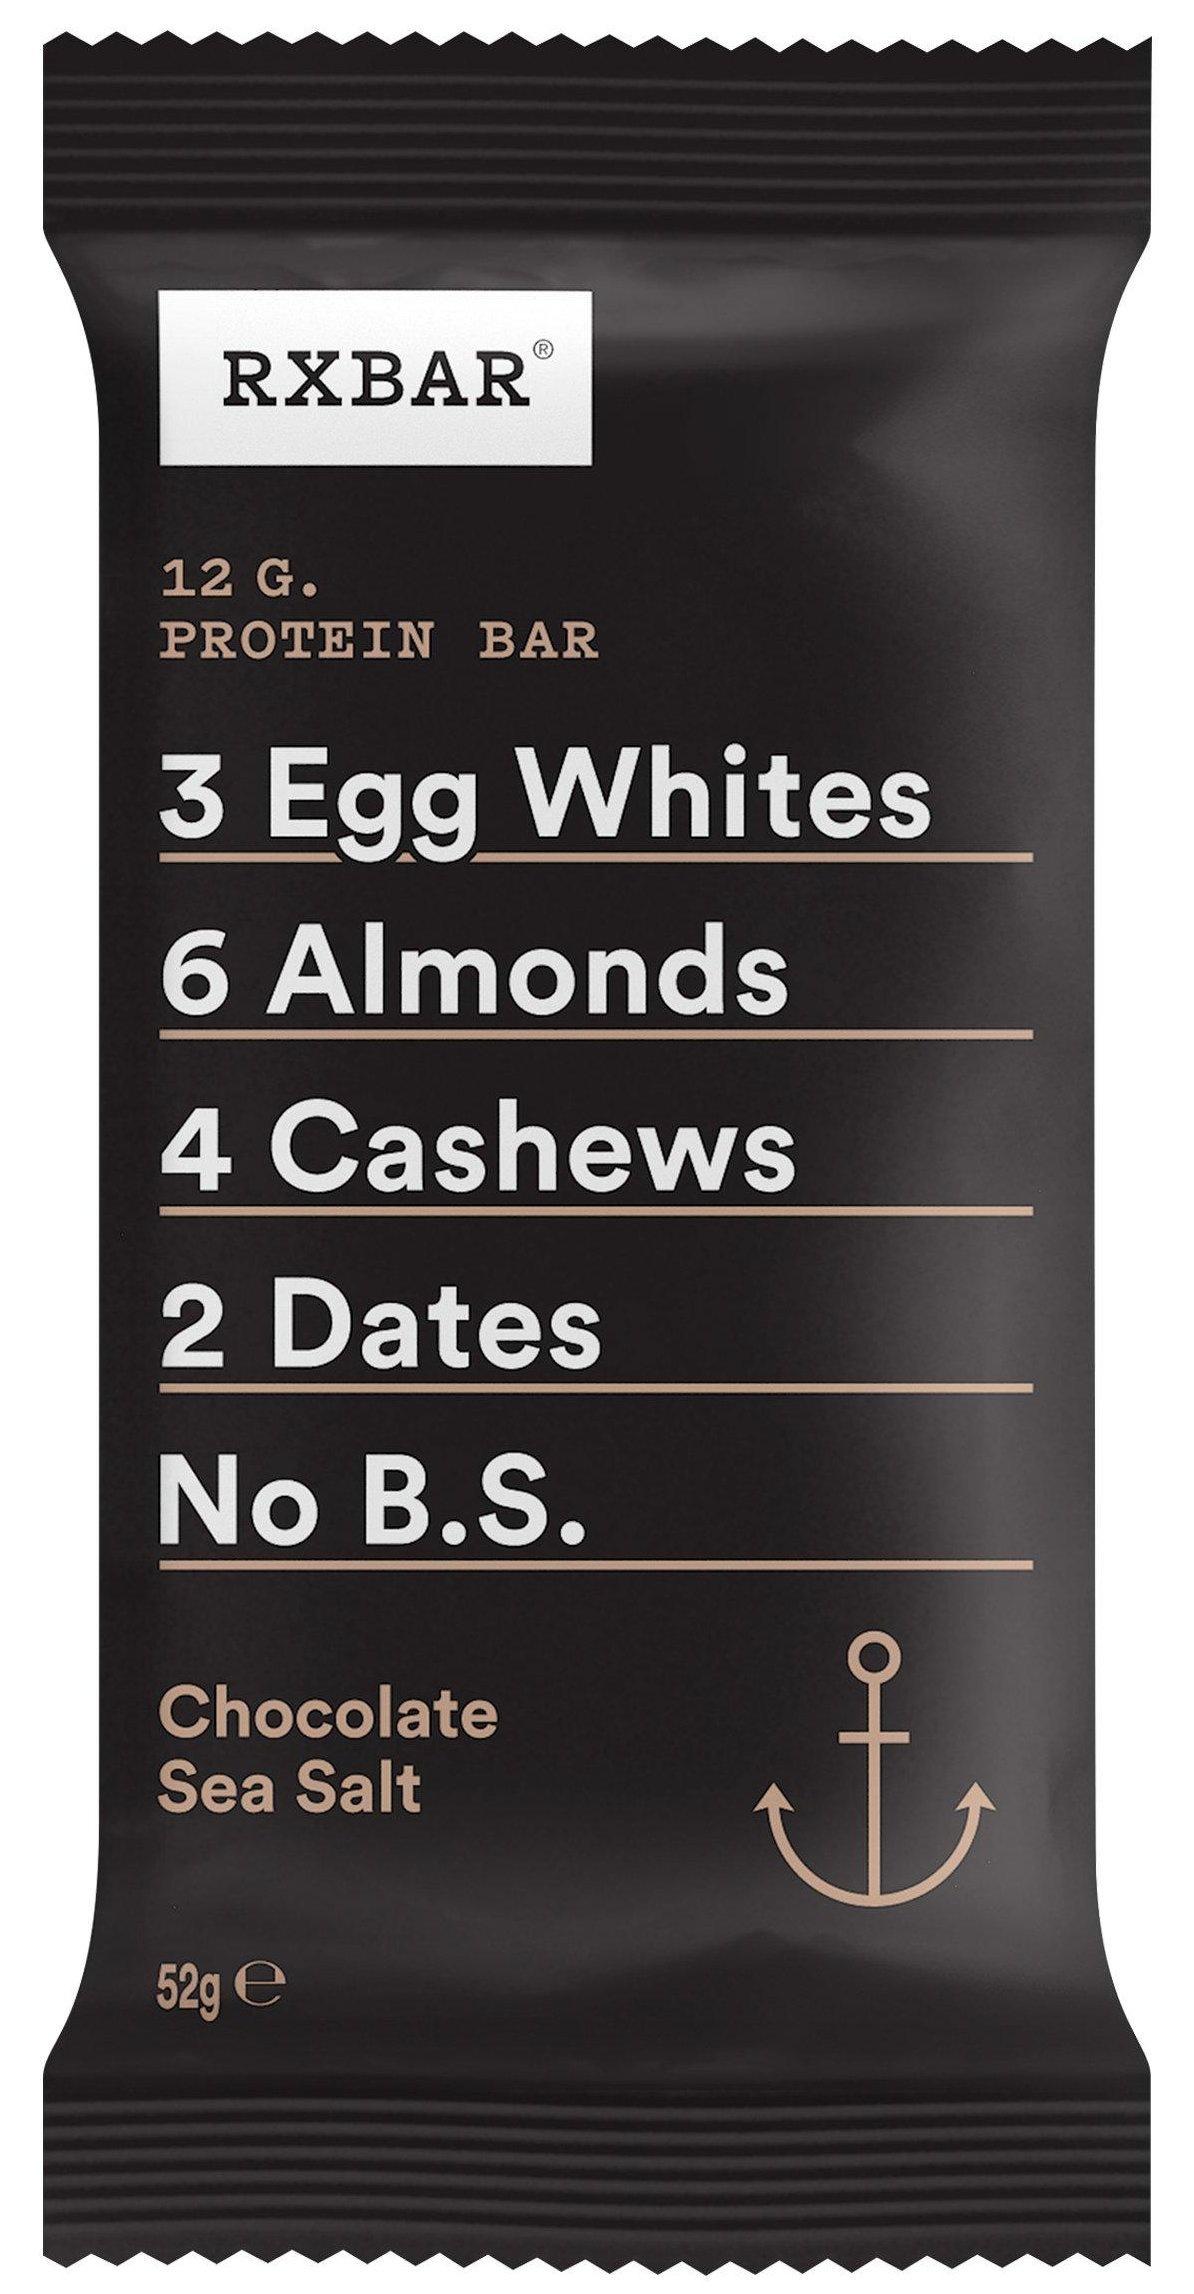 RXBAR Proteinbar Chocolate Sea Salt | proteinbar og -pulver